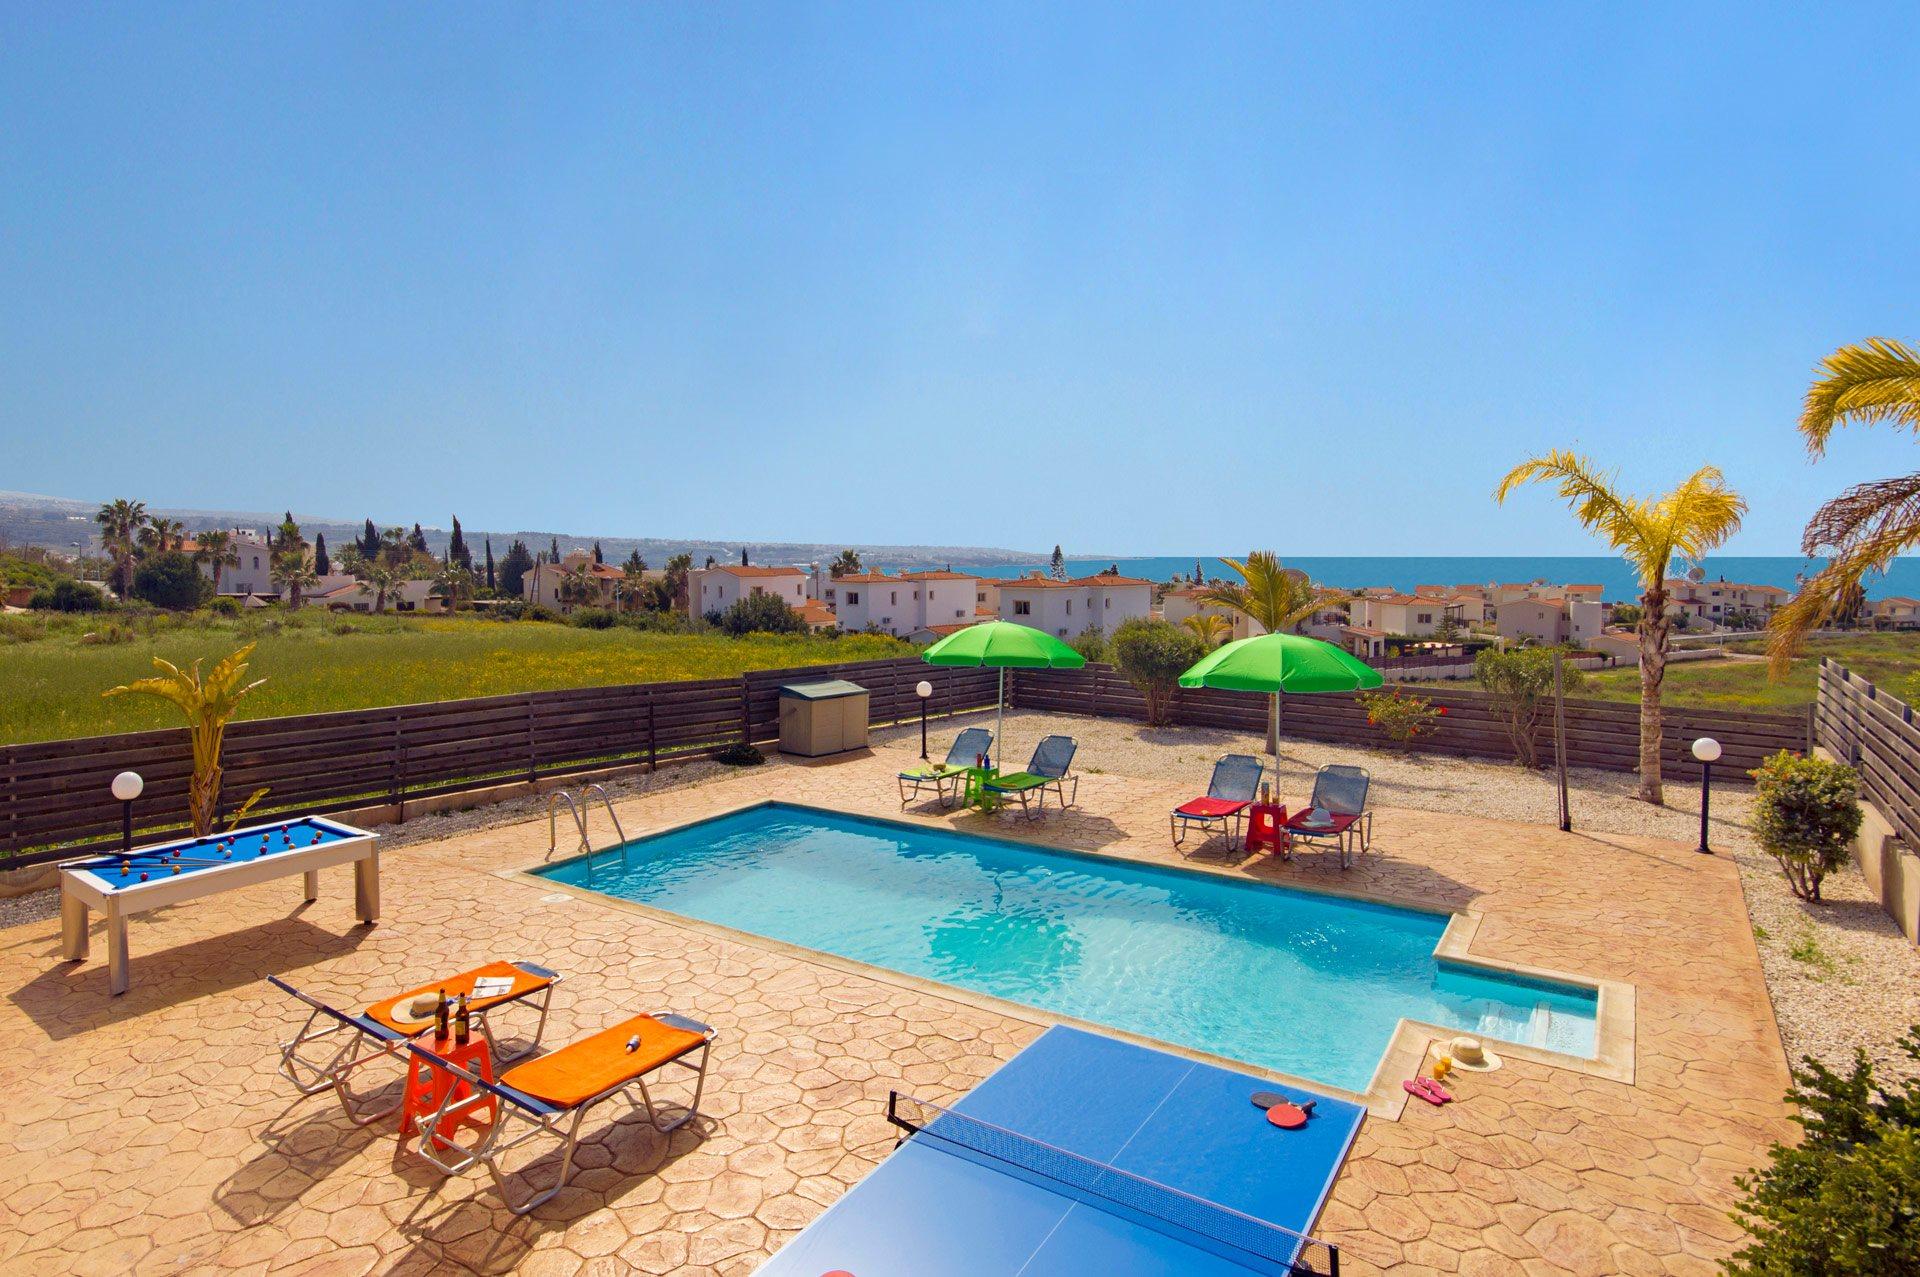 Villa Kassiopeia, Coral Bay, Cyprus